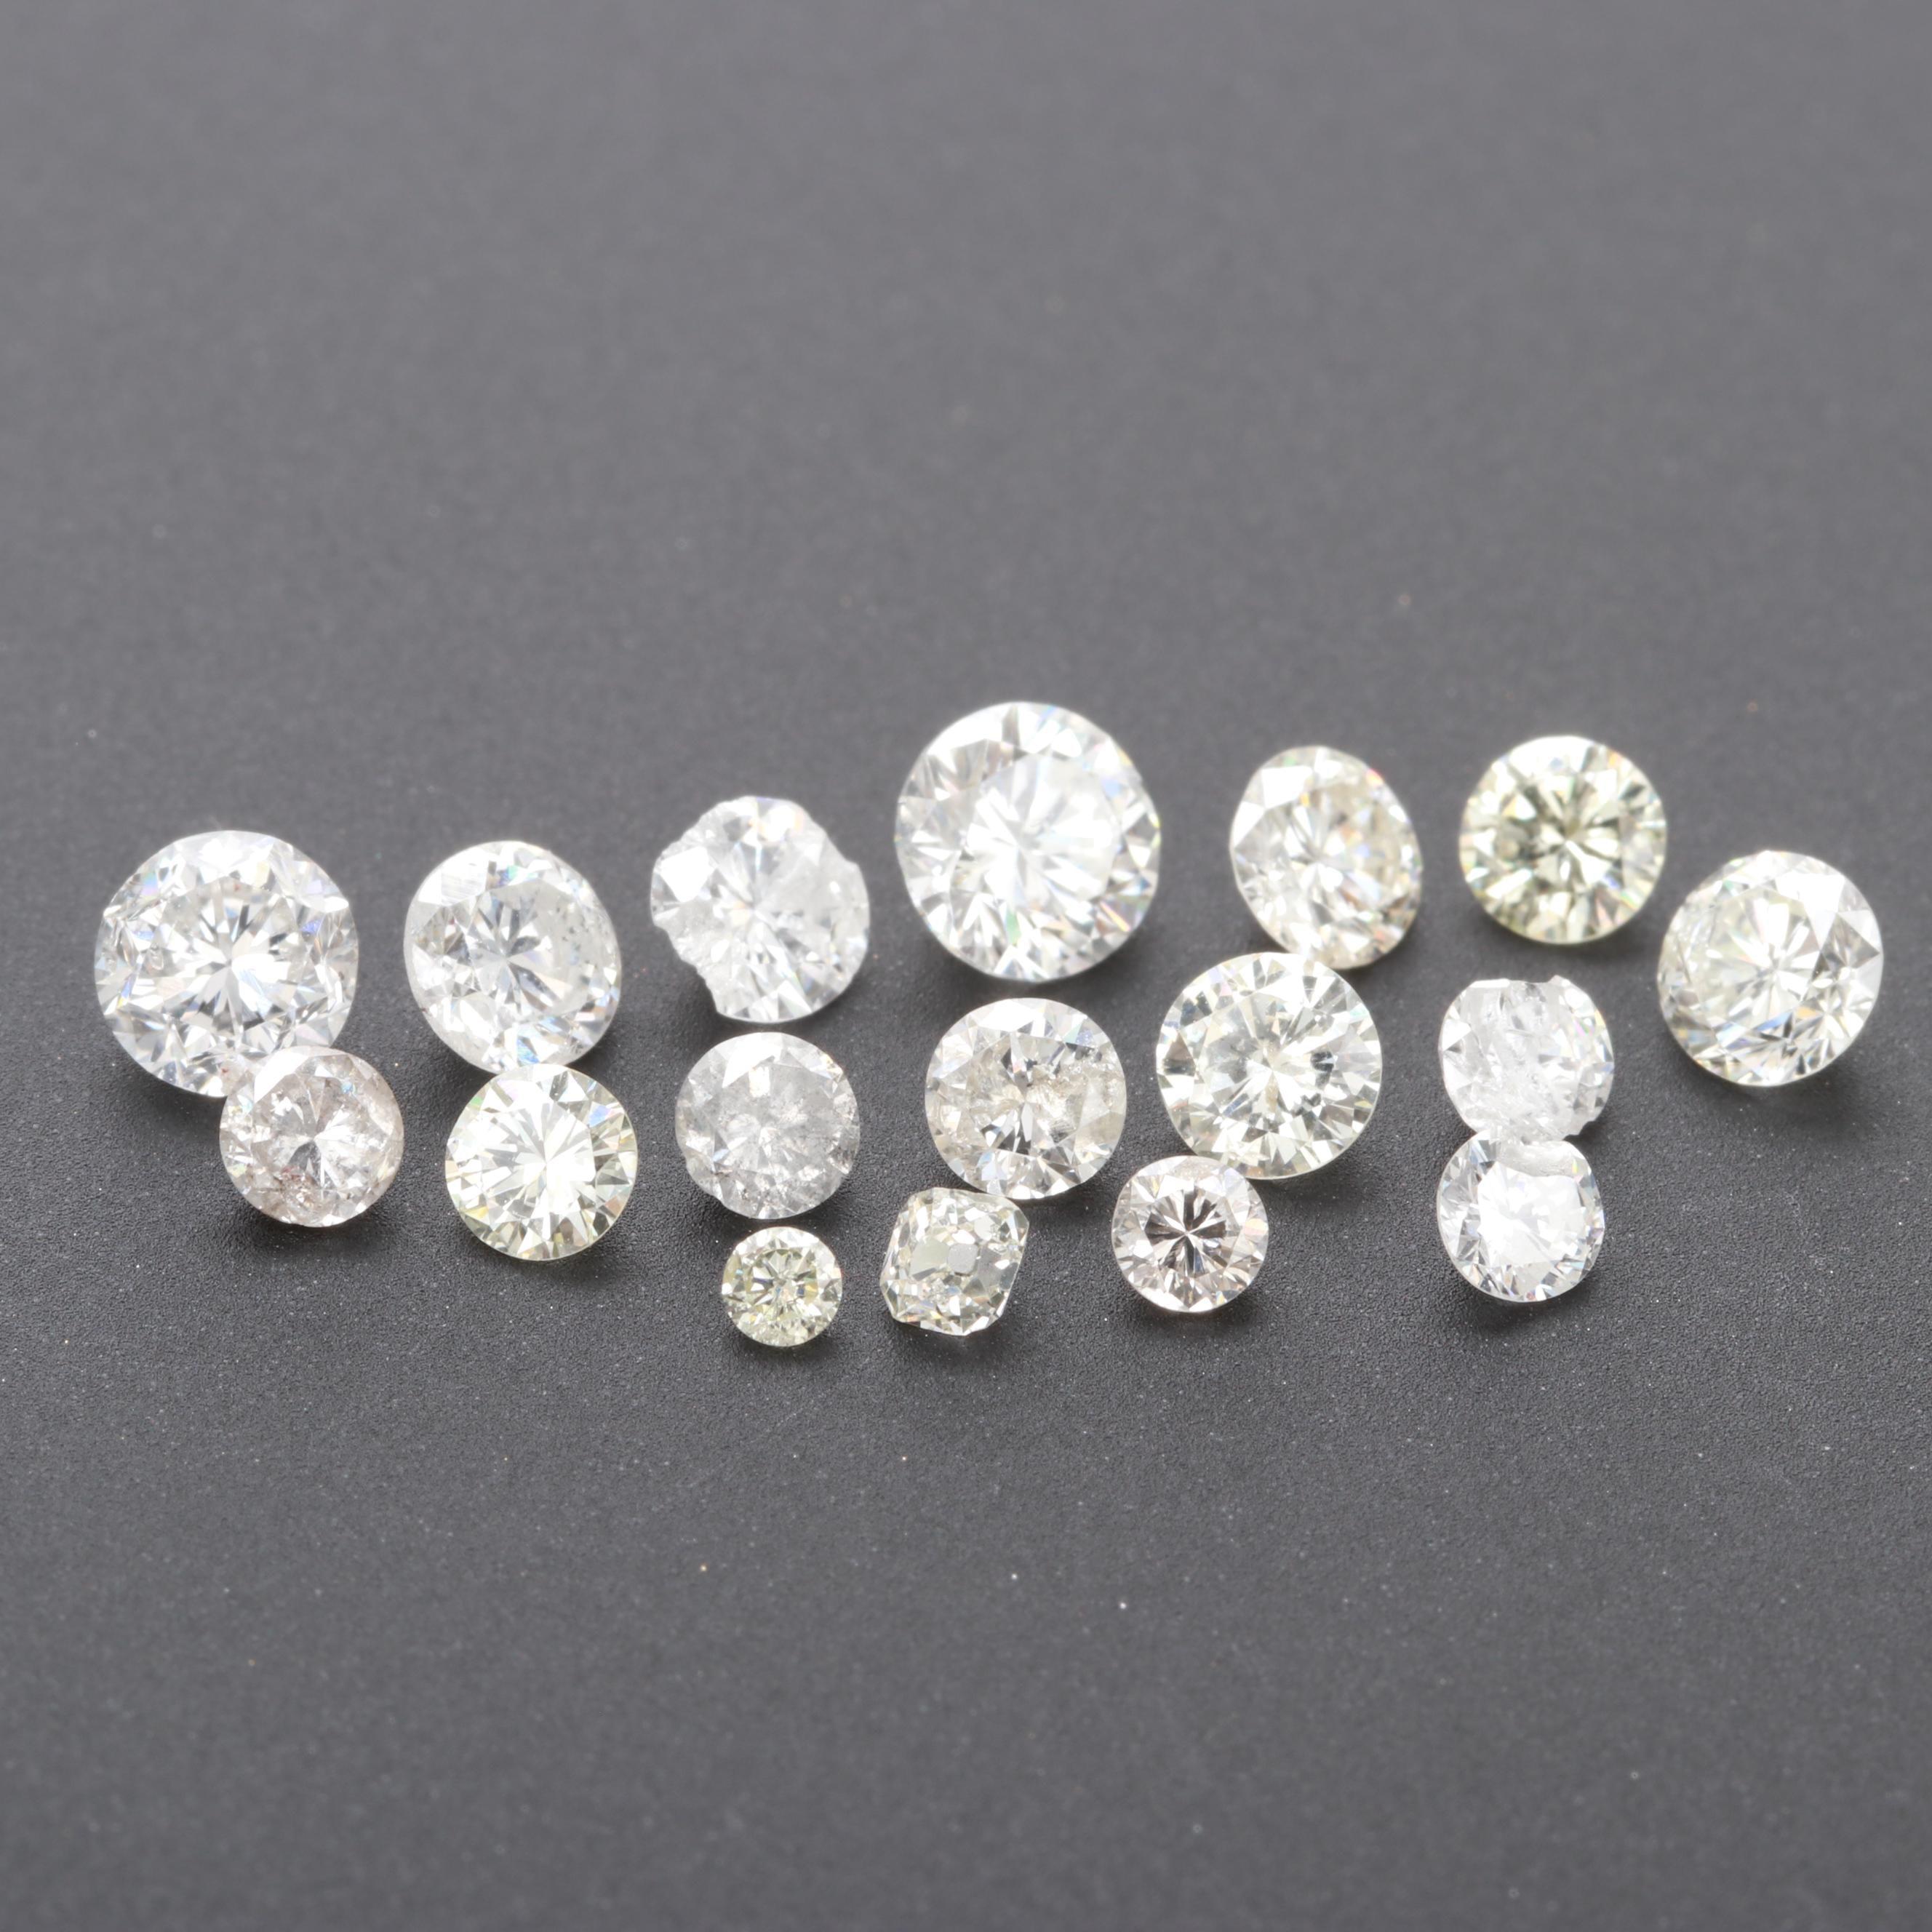 Loose 3.27 CTW Diamond Assortment